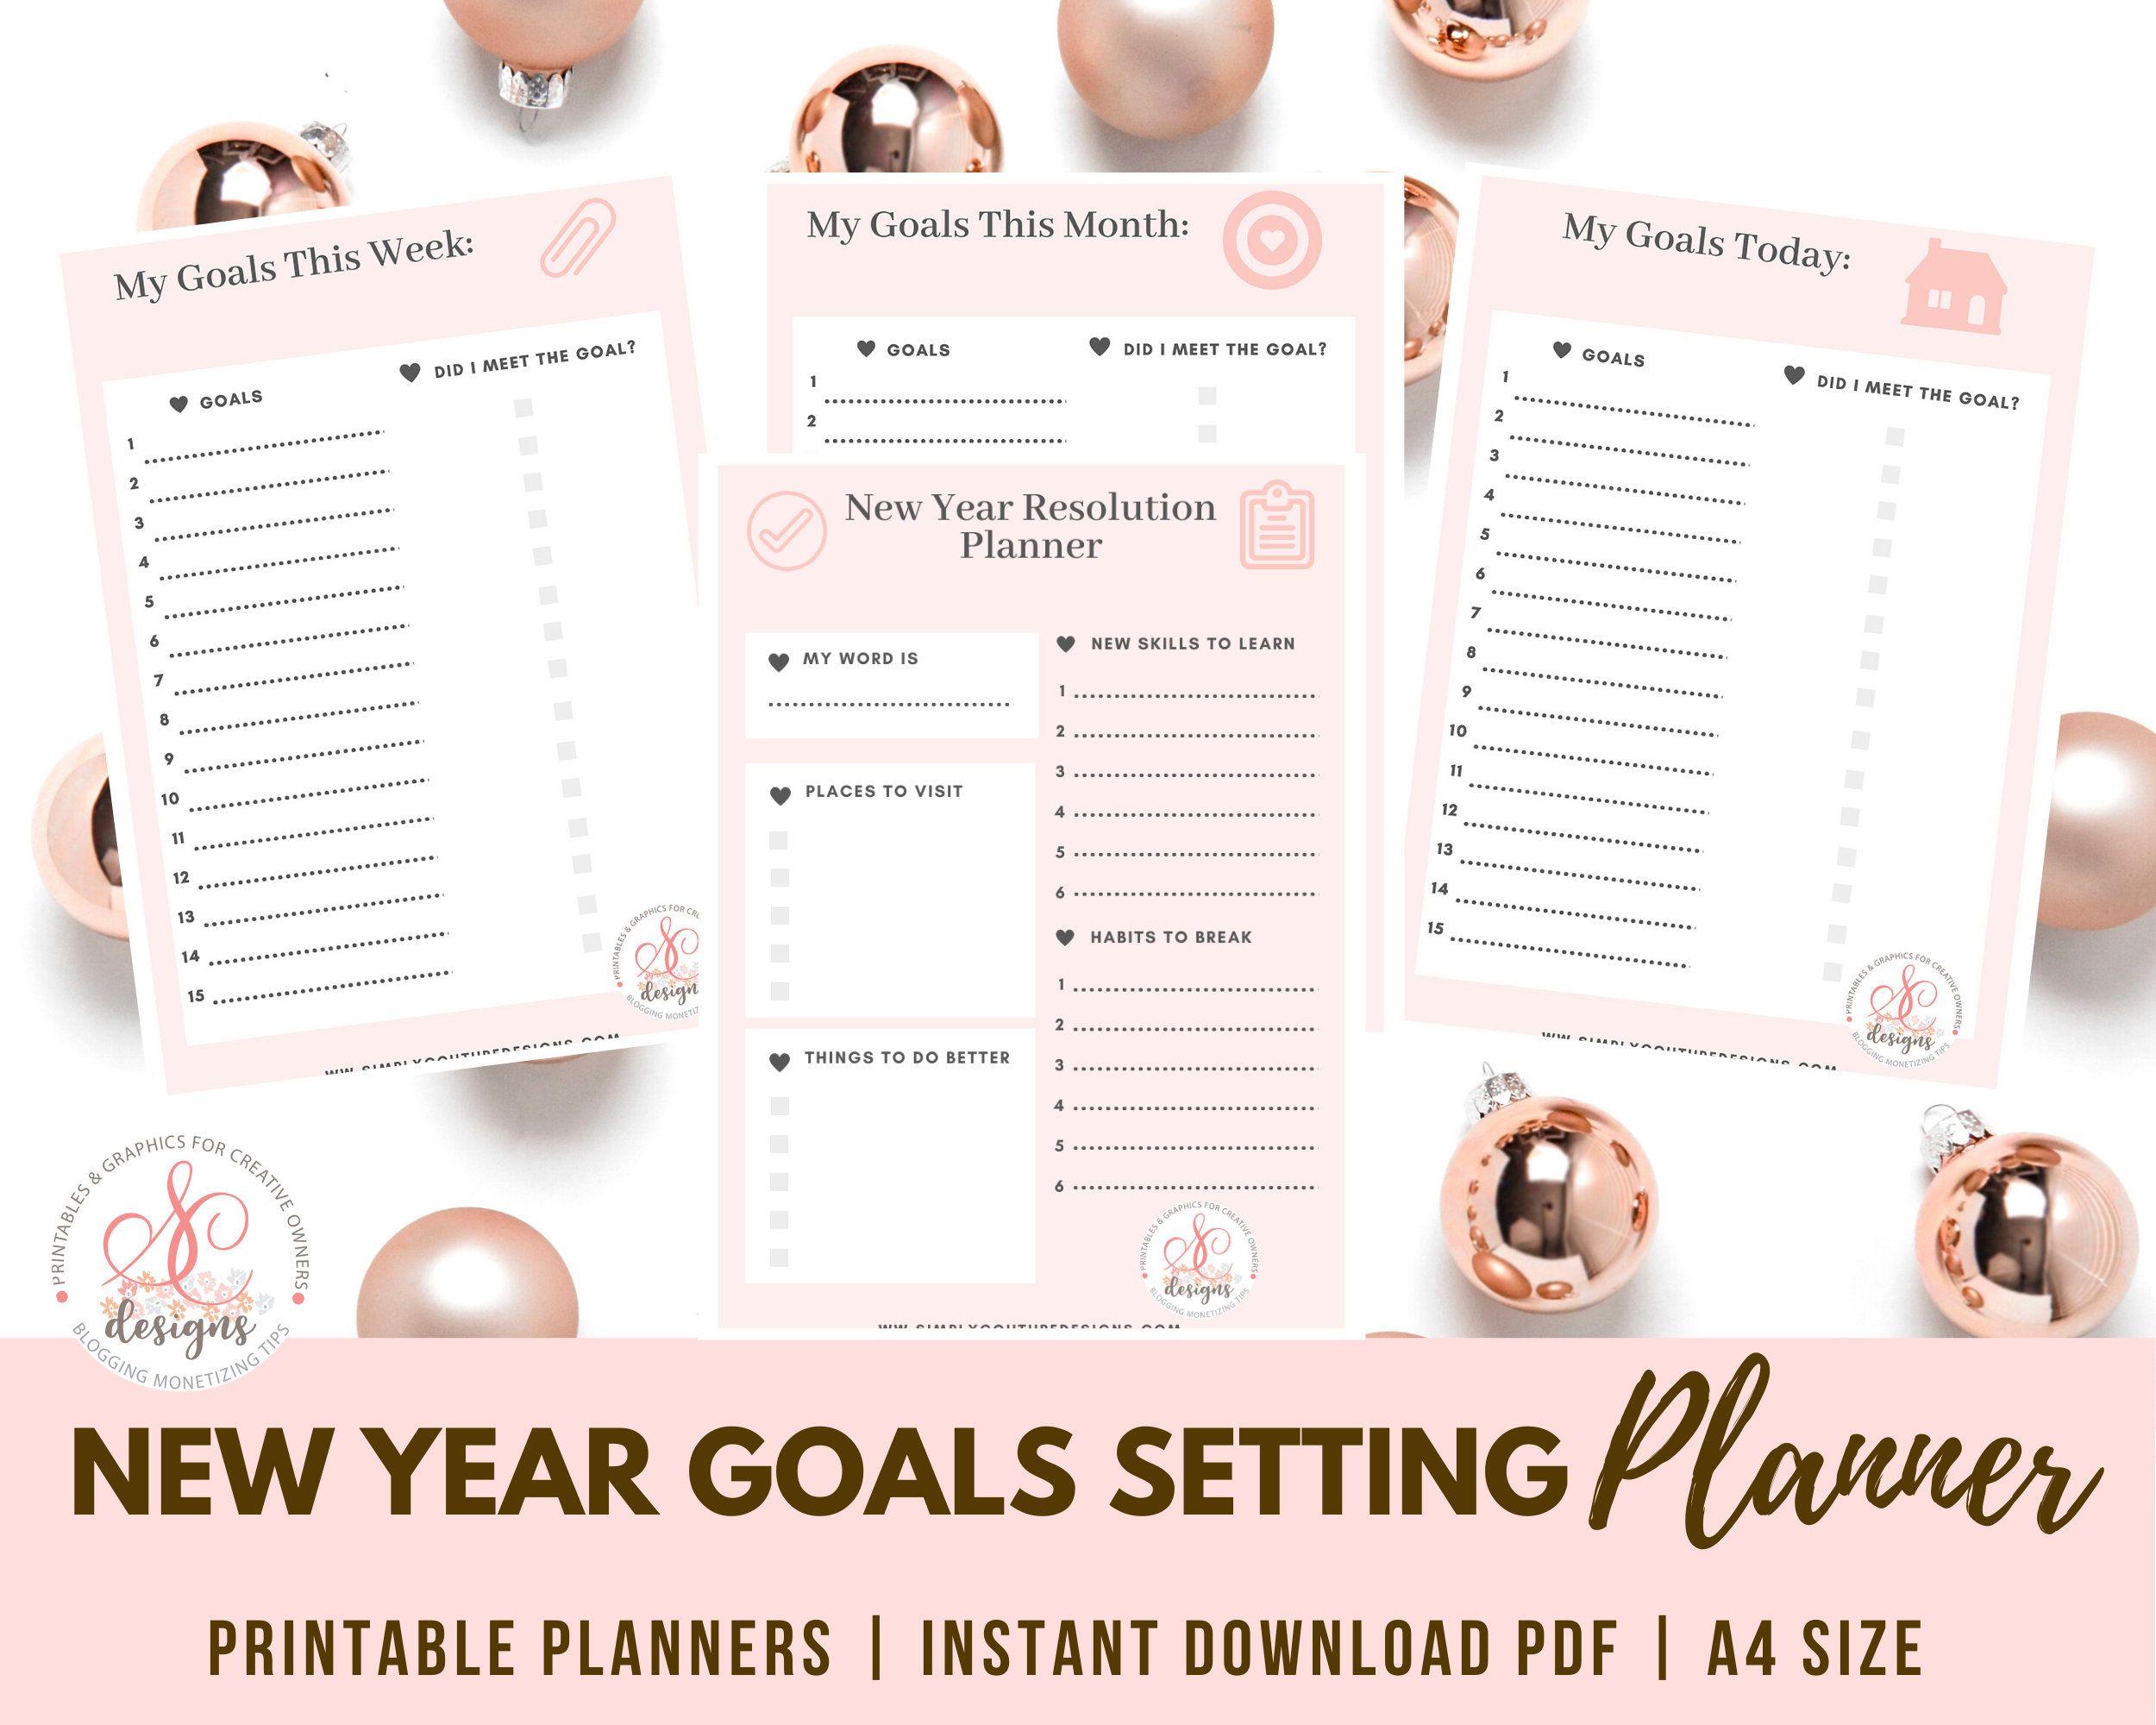 2020 2021 Yearly Goal Planner Printable Calendar Planner Etsy Goal Planner Printable Planner Calendar Printables Goals Planner